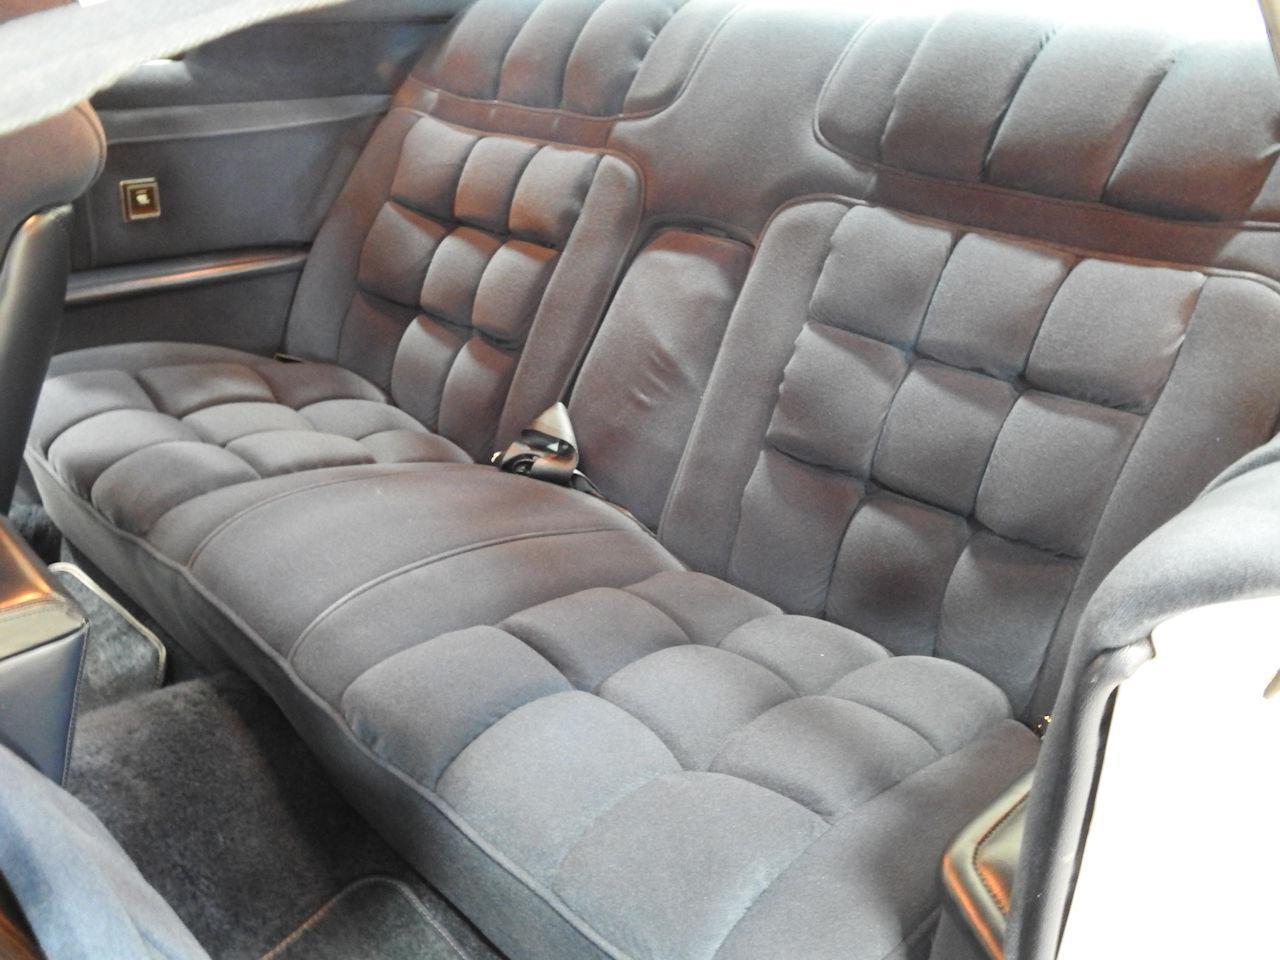 1979 Lincoln MKV 72